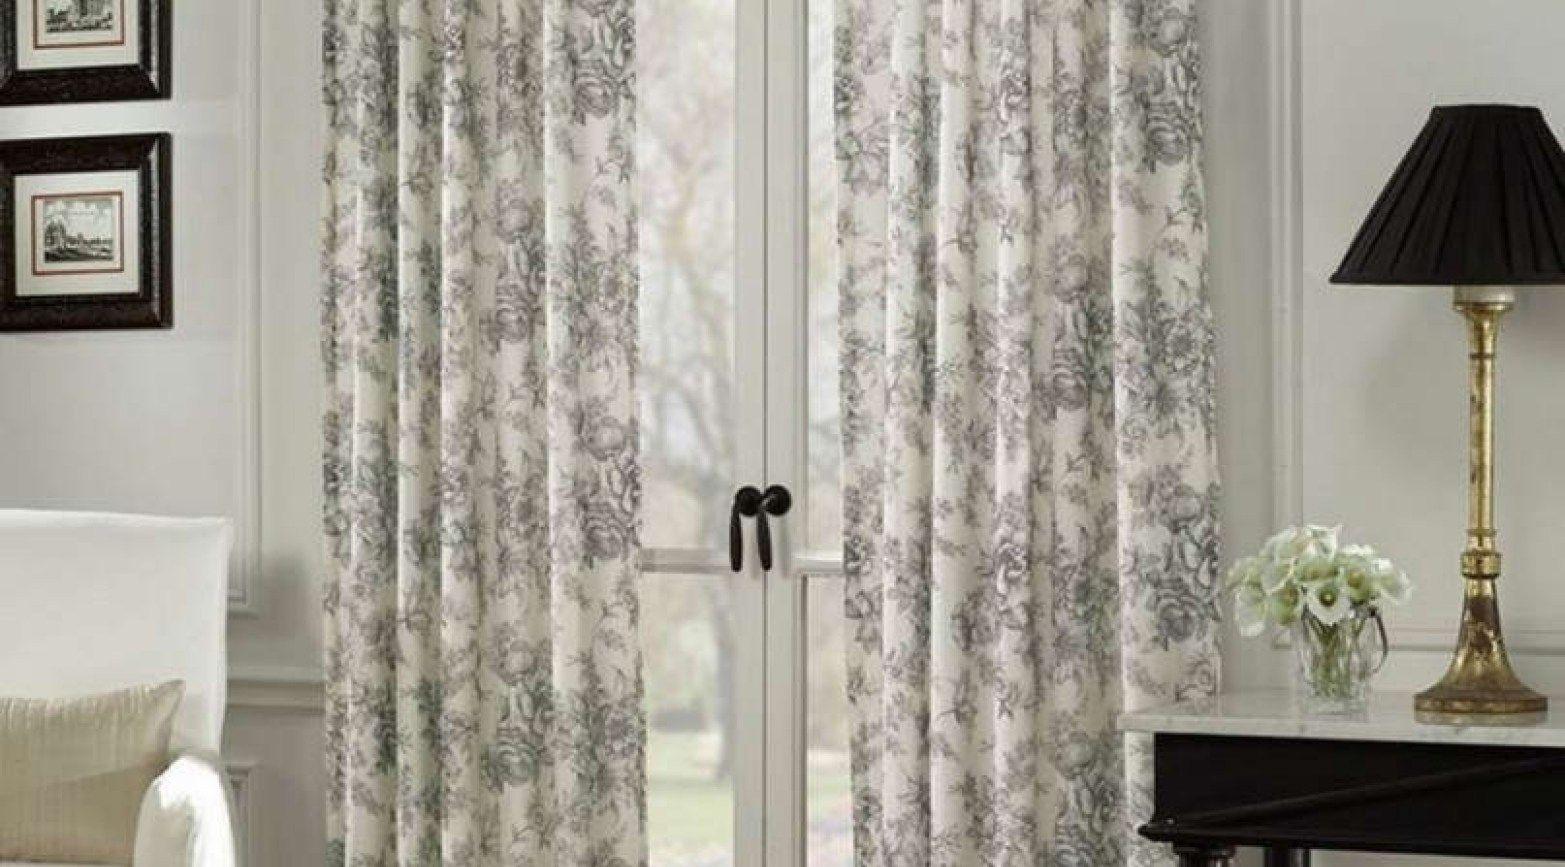 Standard Sliding Glass Door Curtain Size Sliding Glass Door